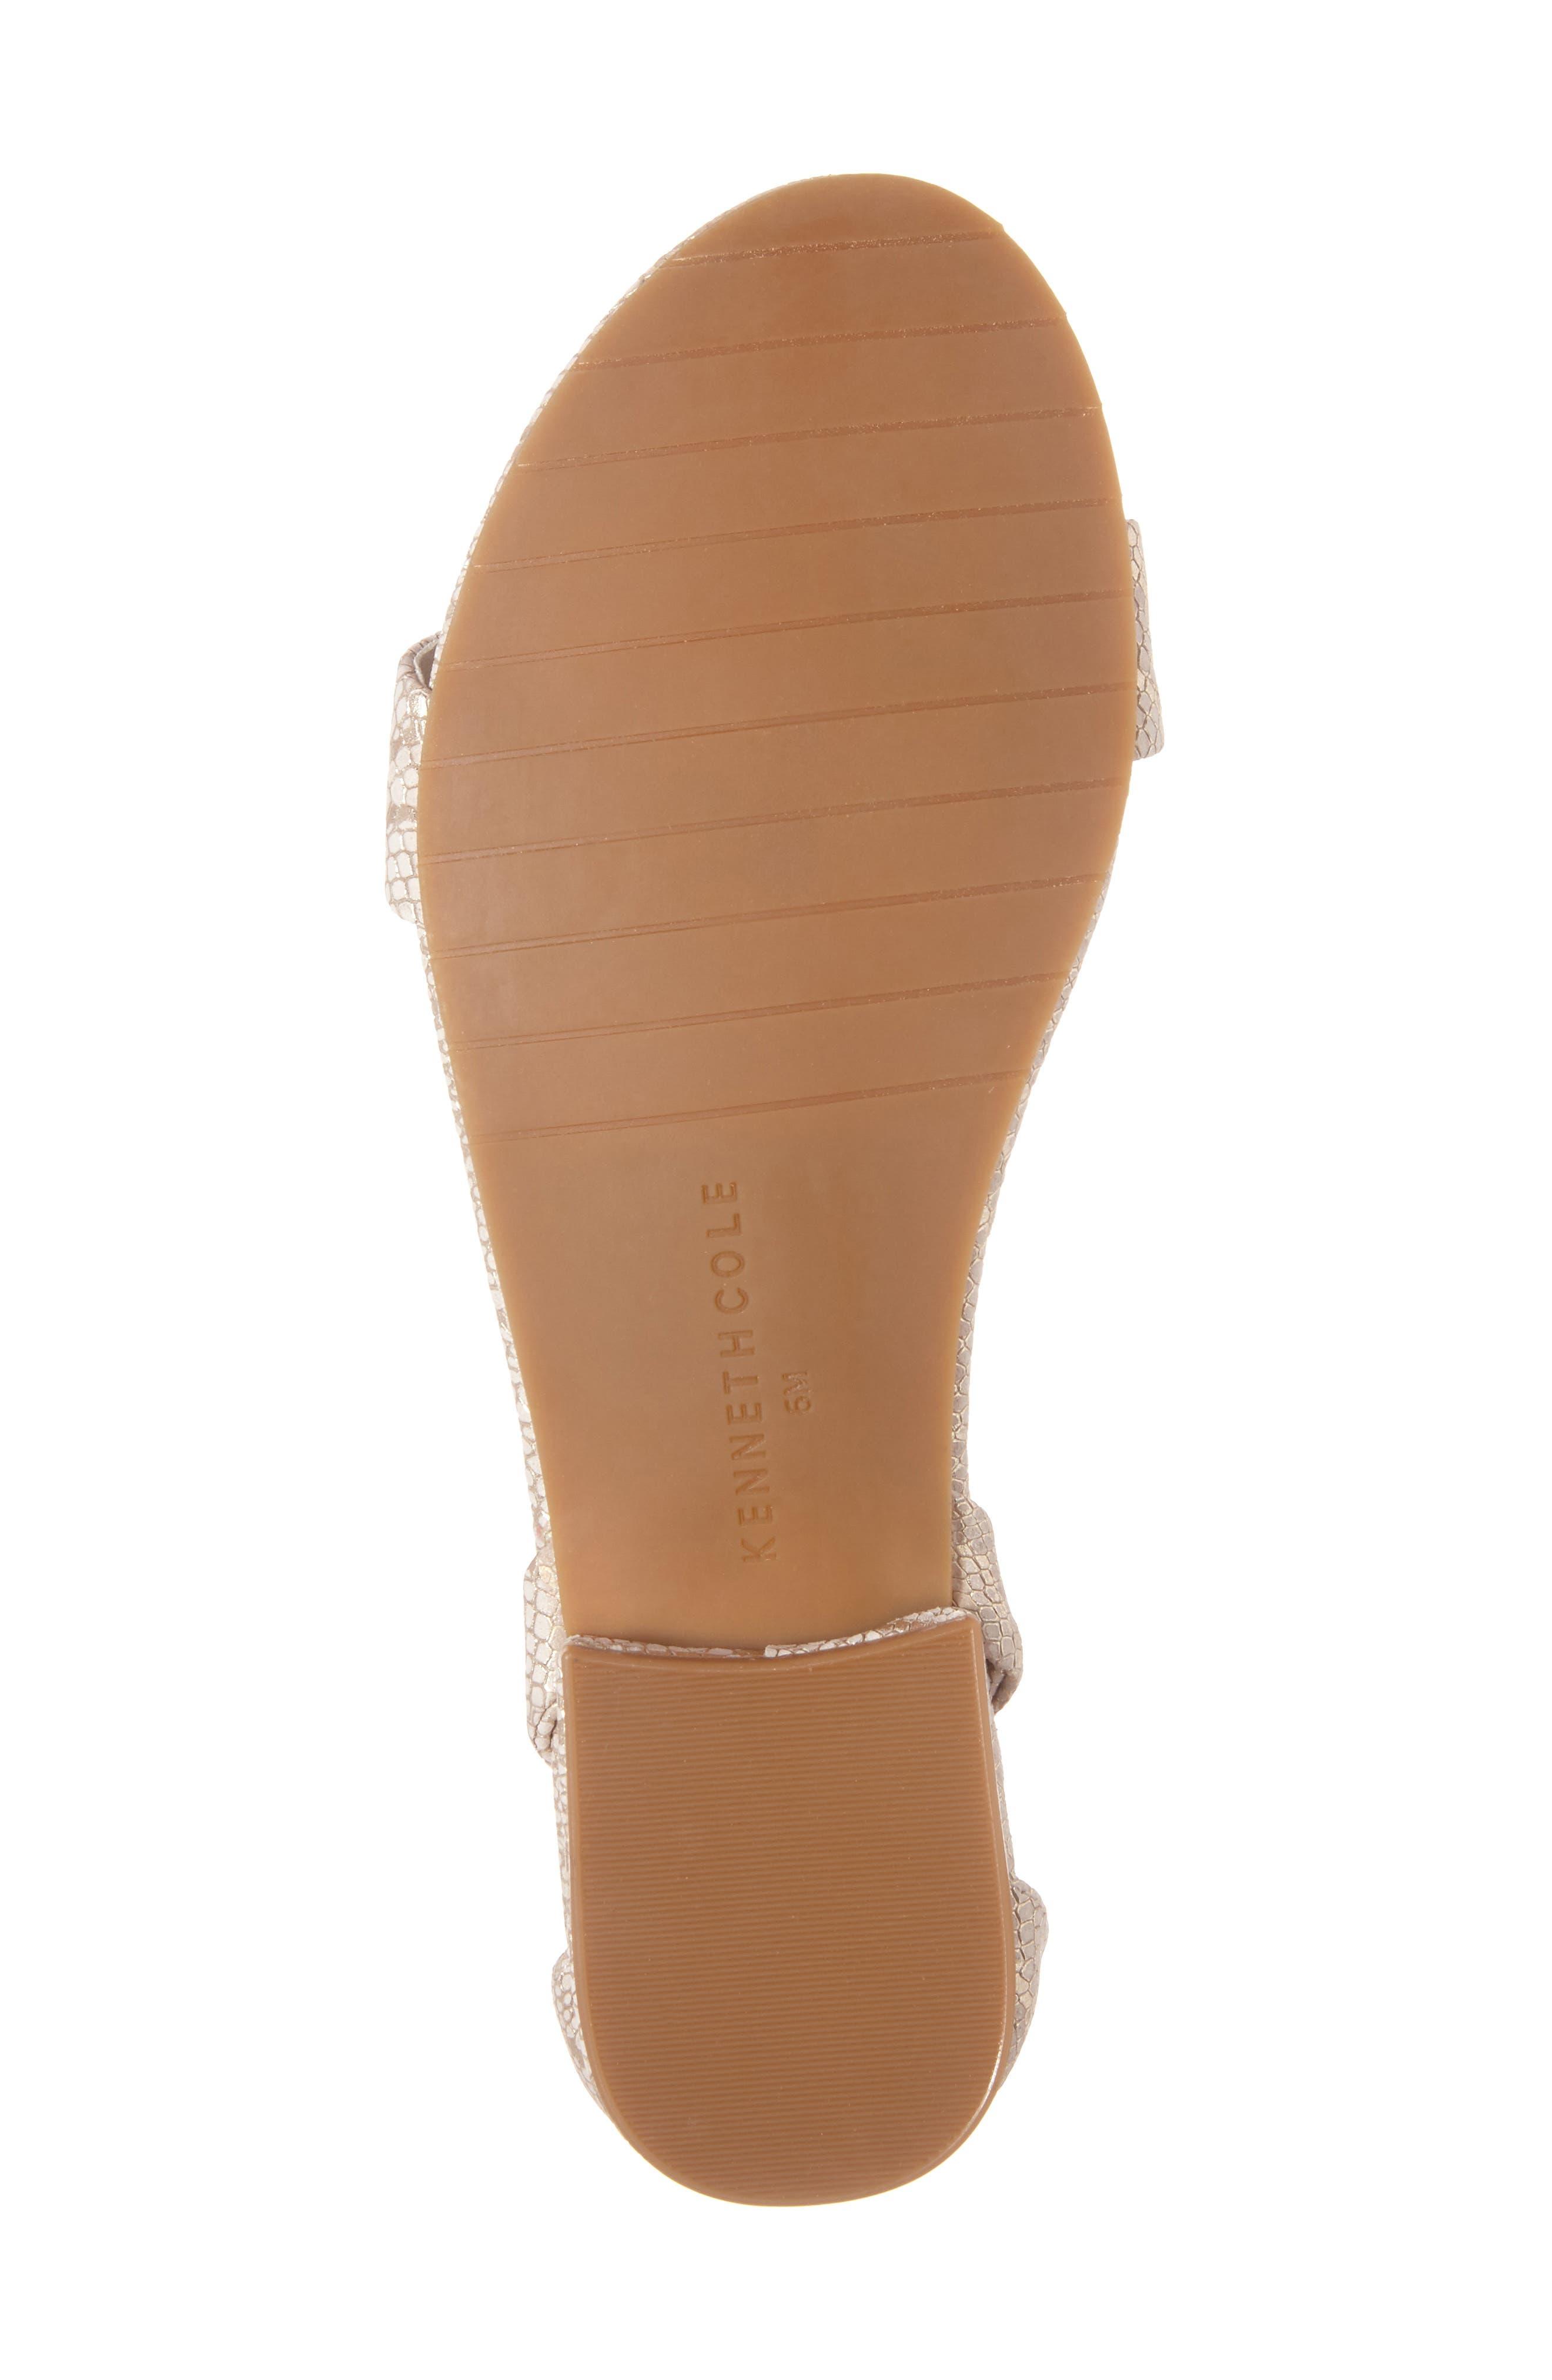 Valen Tassel Lace-Up Sandal,                             Alternate thumbnail 60, color,